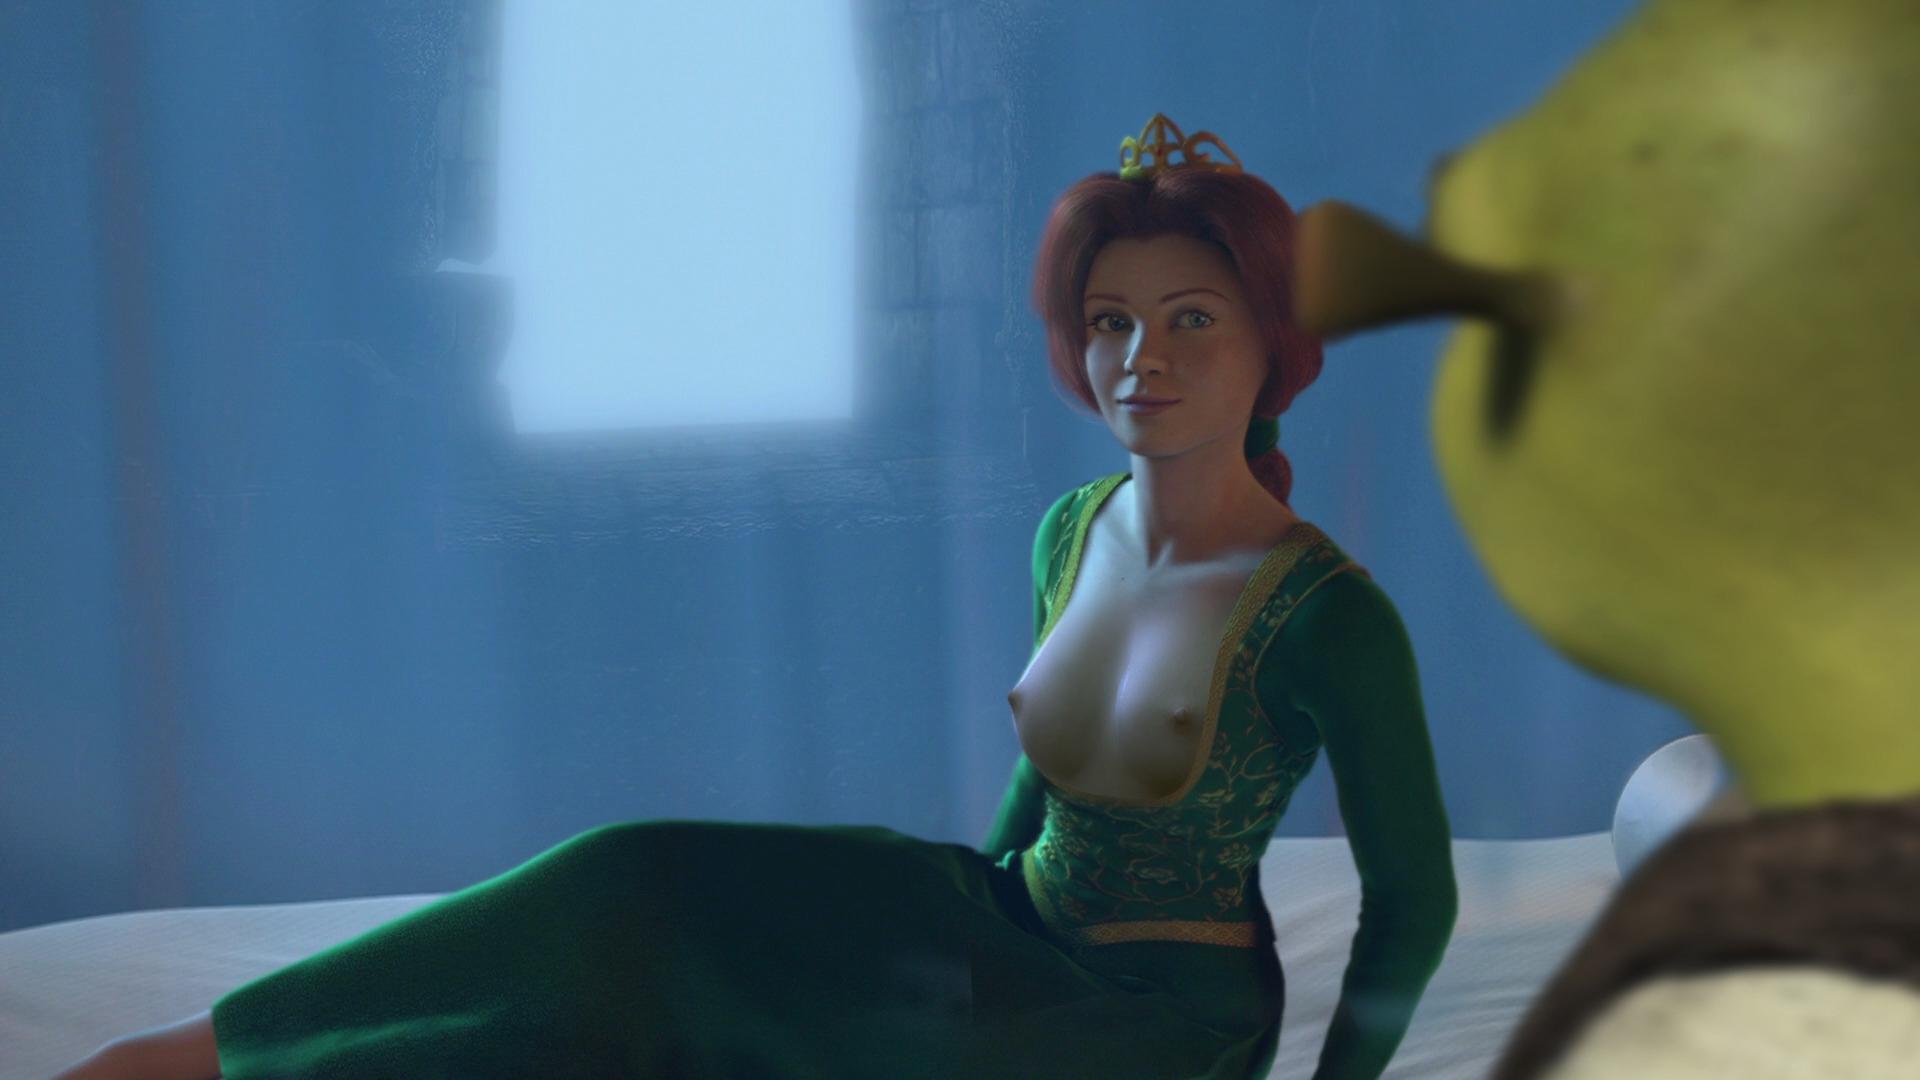 Shrek fiona nudr sexy gallery